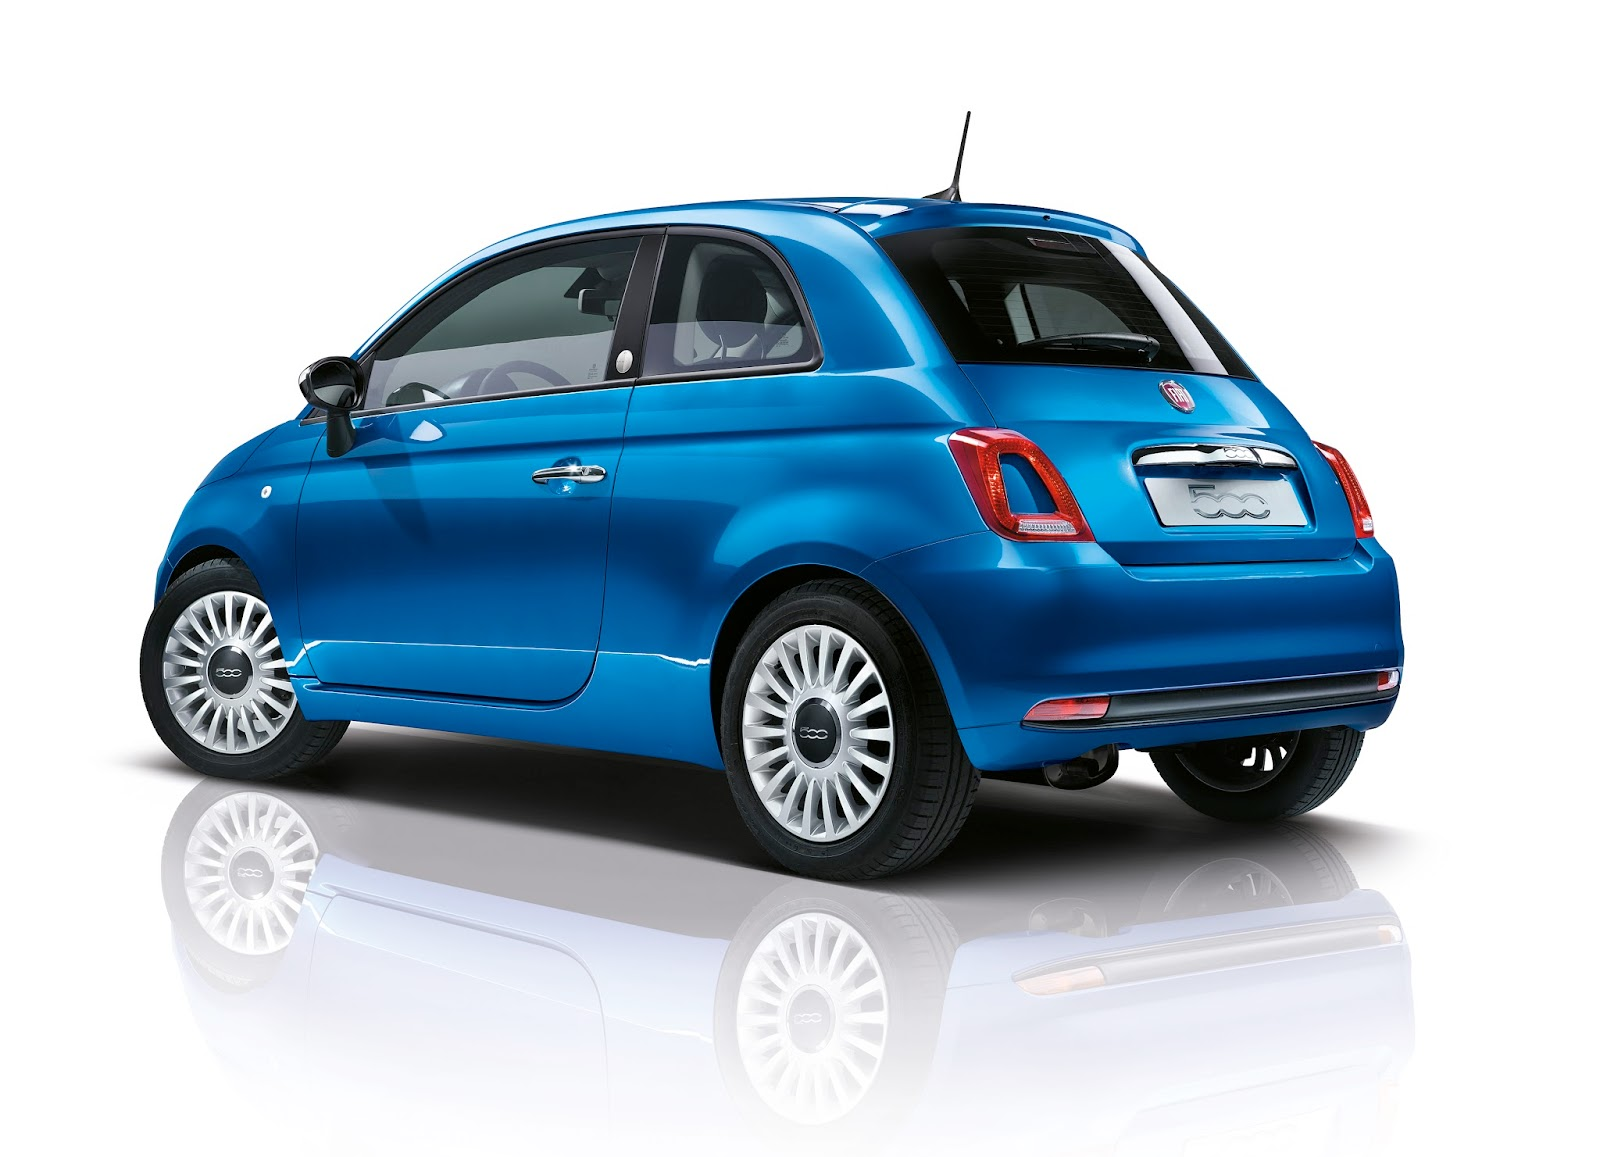 170331 Fiat Mirror 02 Ένα 500αρακι για... techfreaks Fiat, Fiat 500, Fiat 500 Mirror, προσφορές